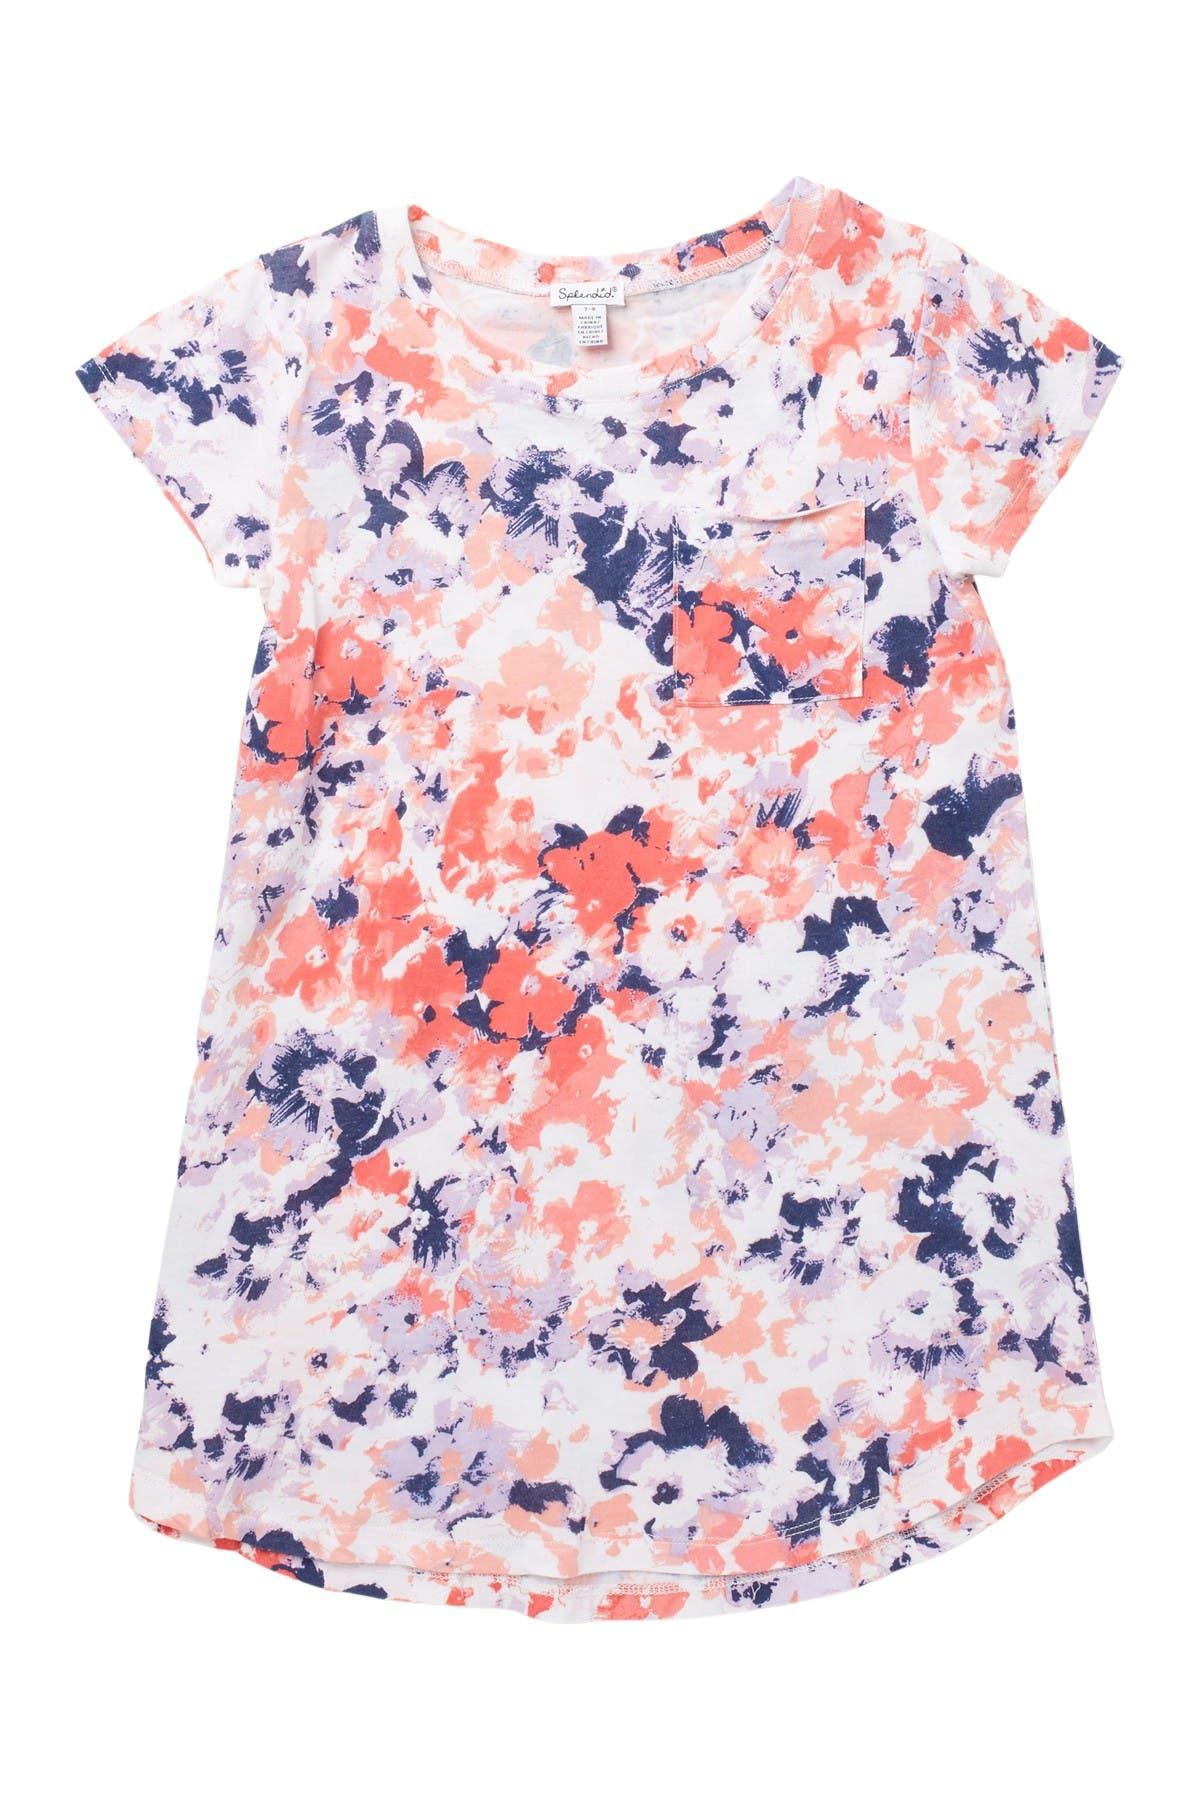 Image of Splendid Floral Print Dress